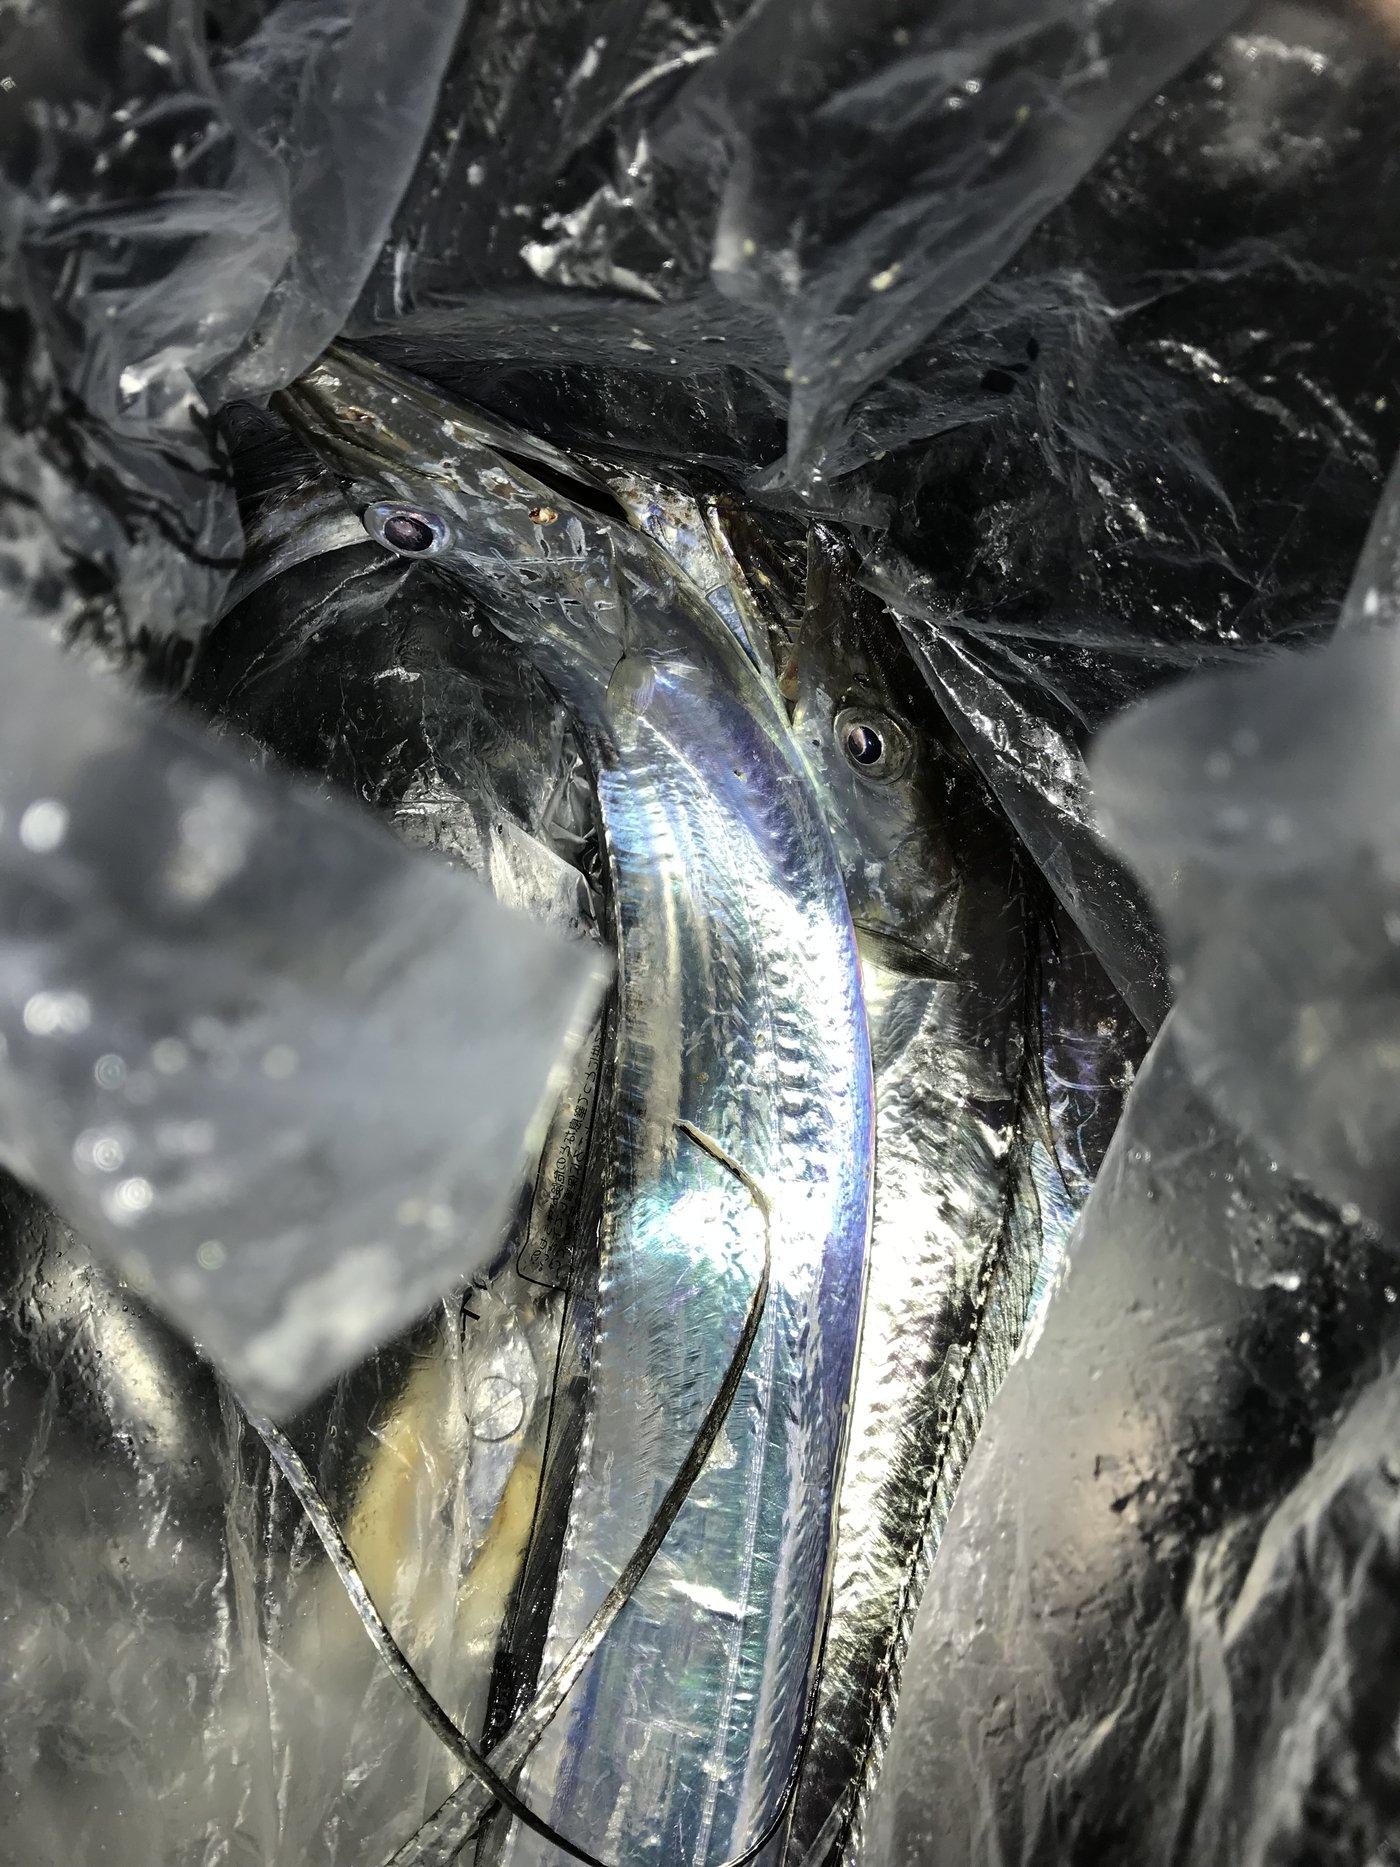 peeさんの投稿画像,写っている魚はタチウオ